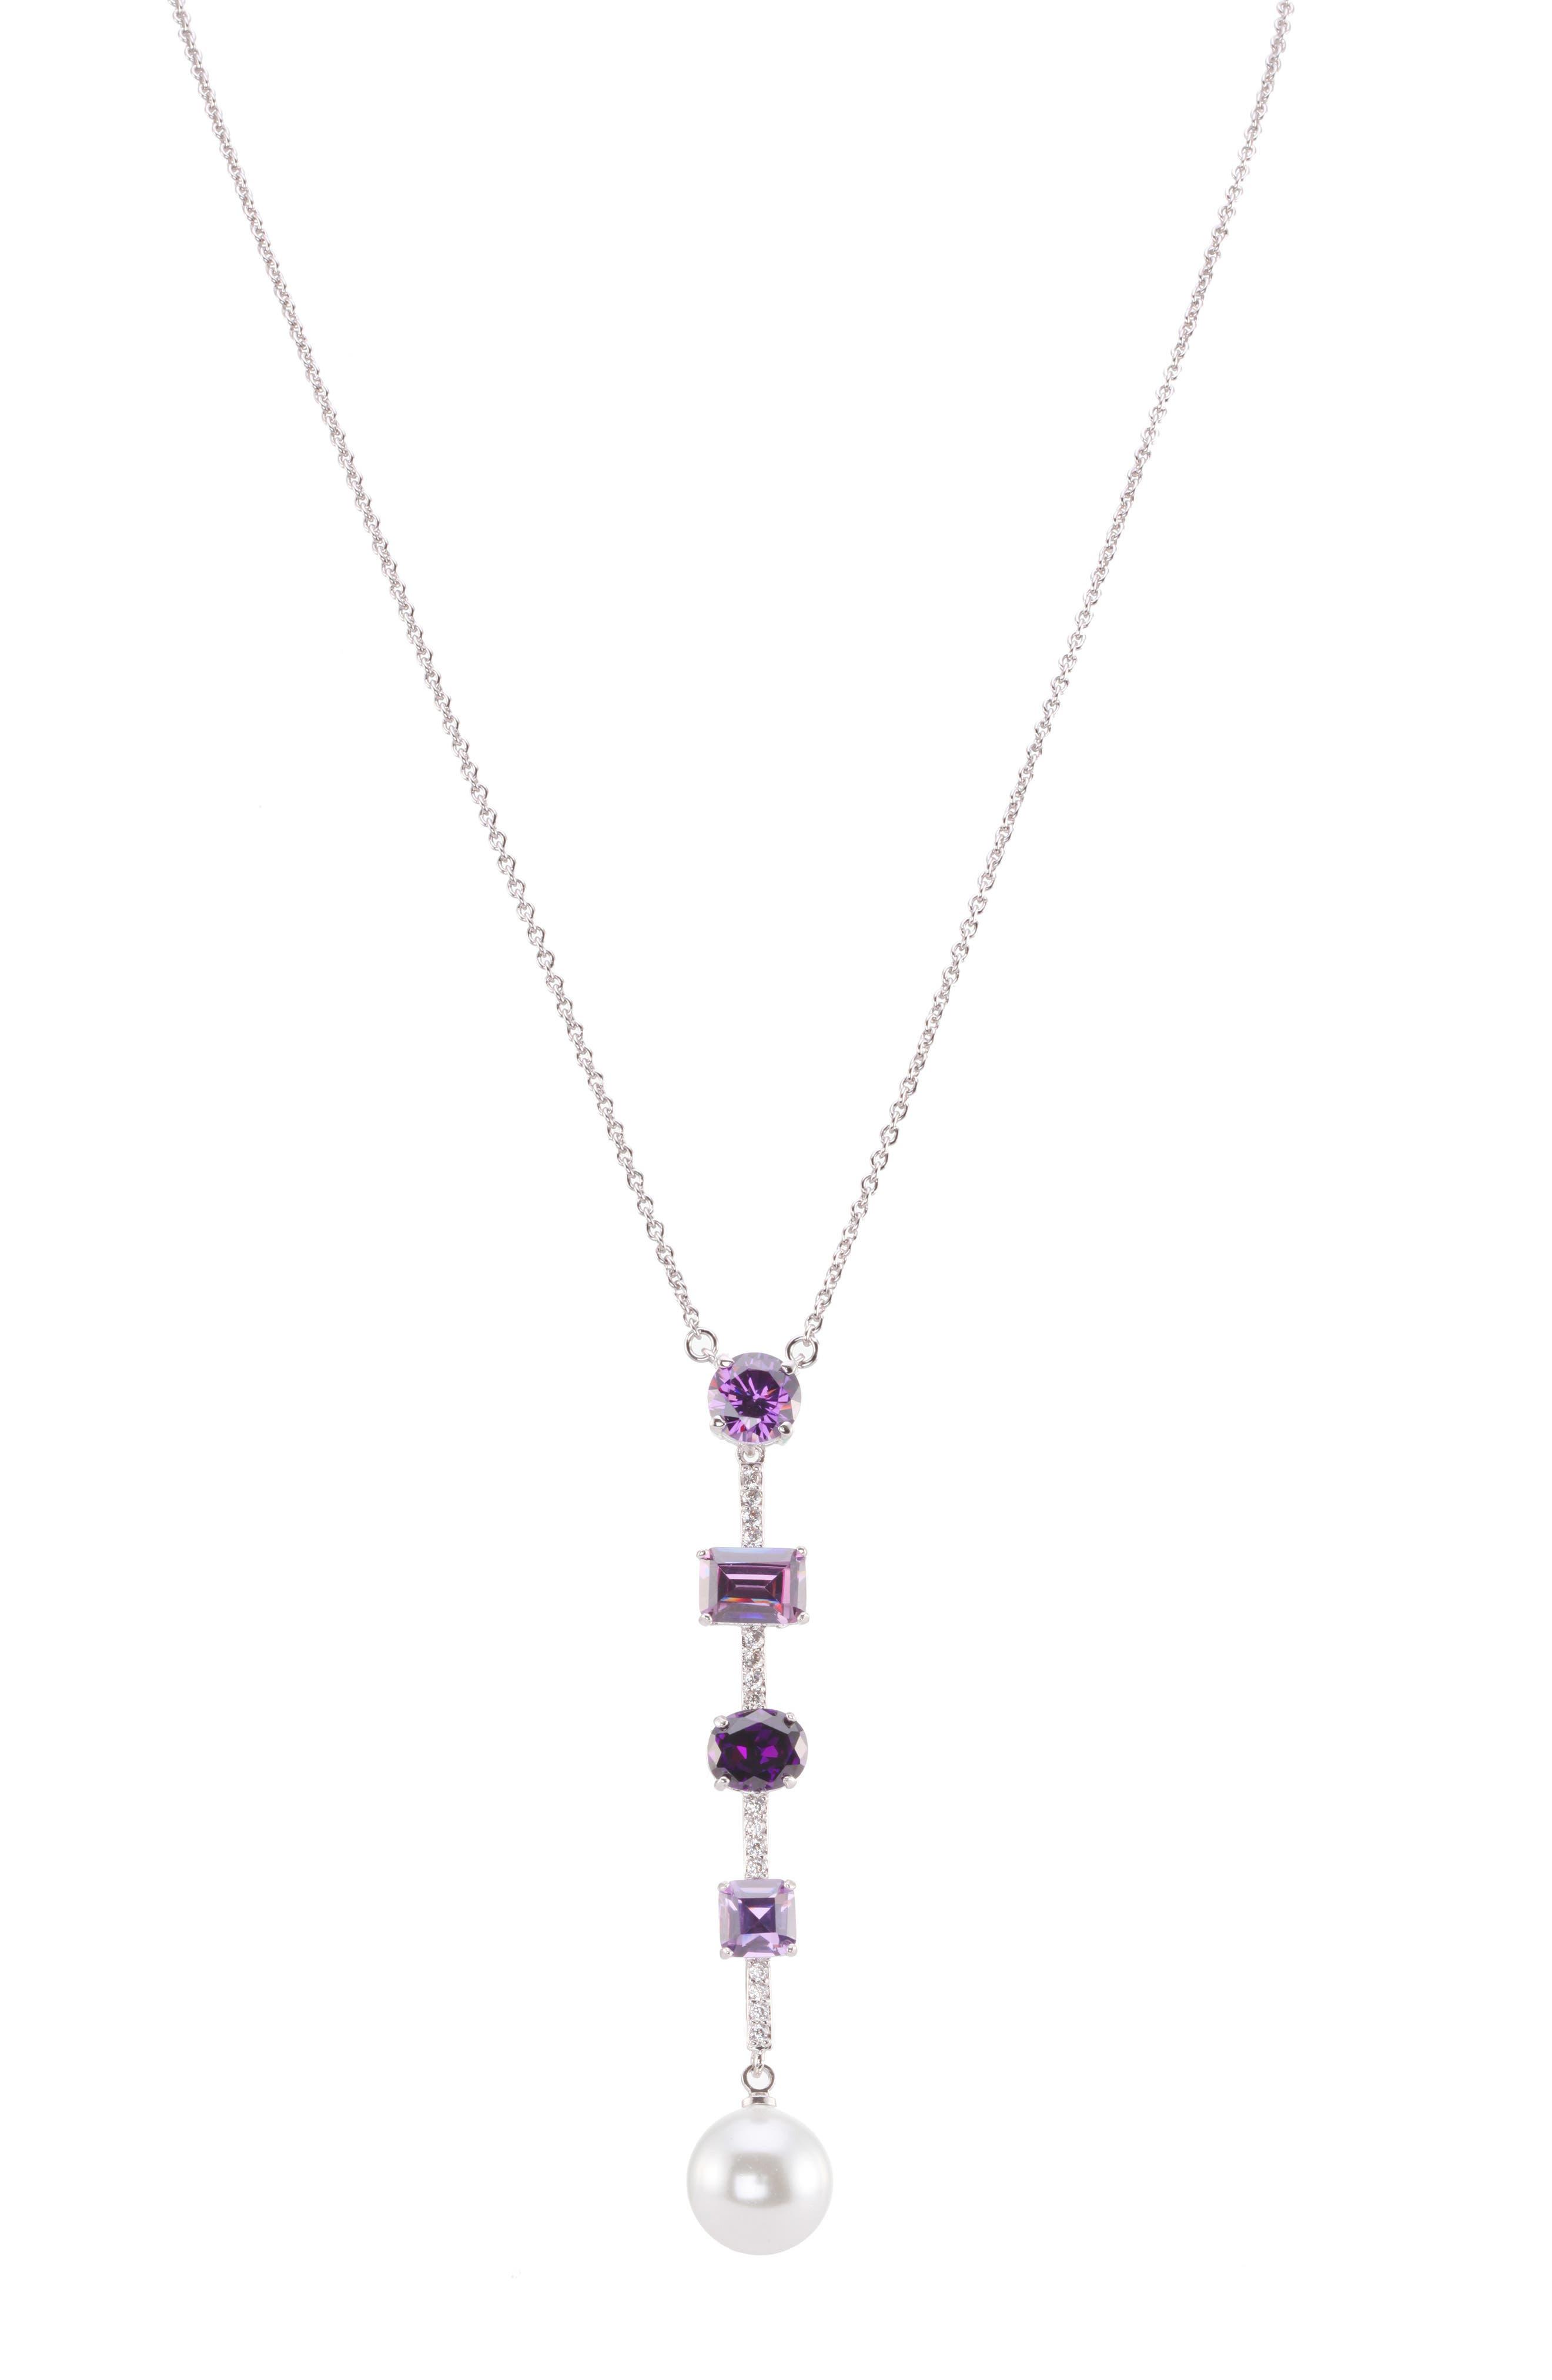 Crystal Y-Necklace,                             Main thumbnail 1, color,                             PEARL/ AMETHYST/ SILVER